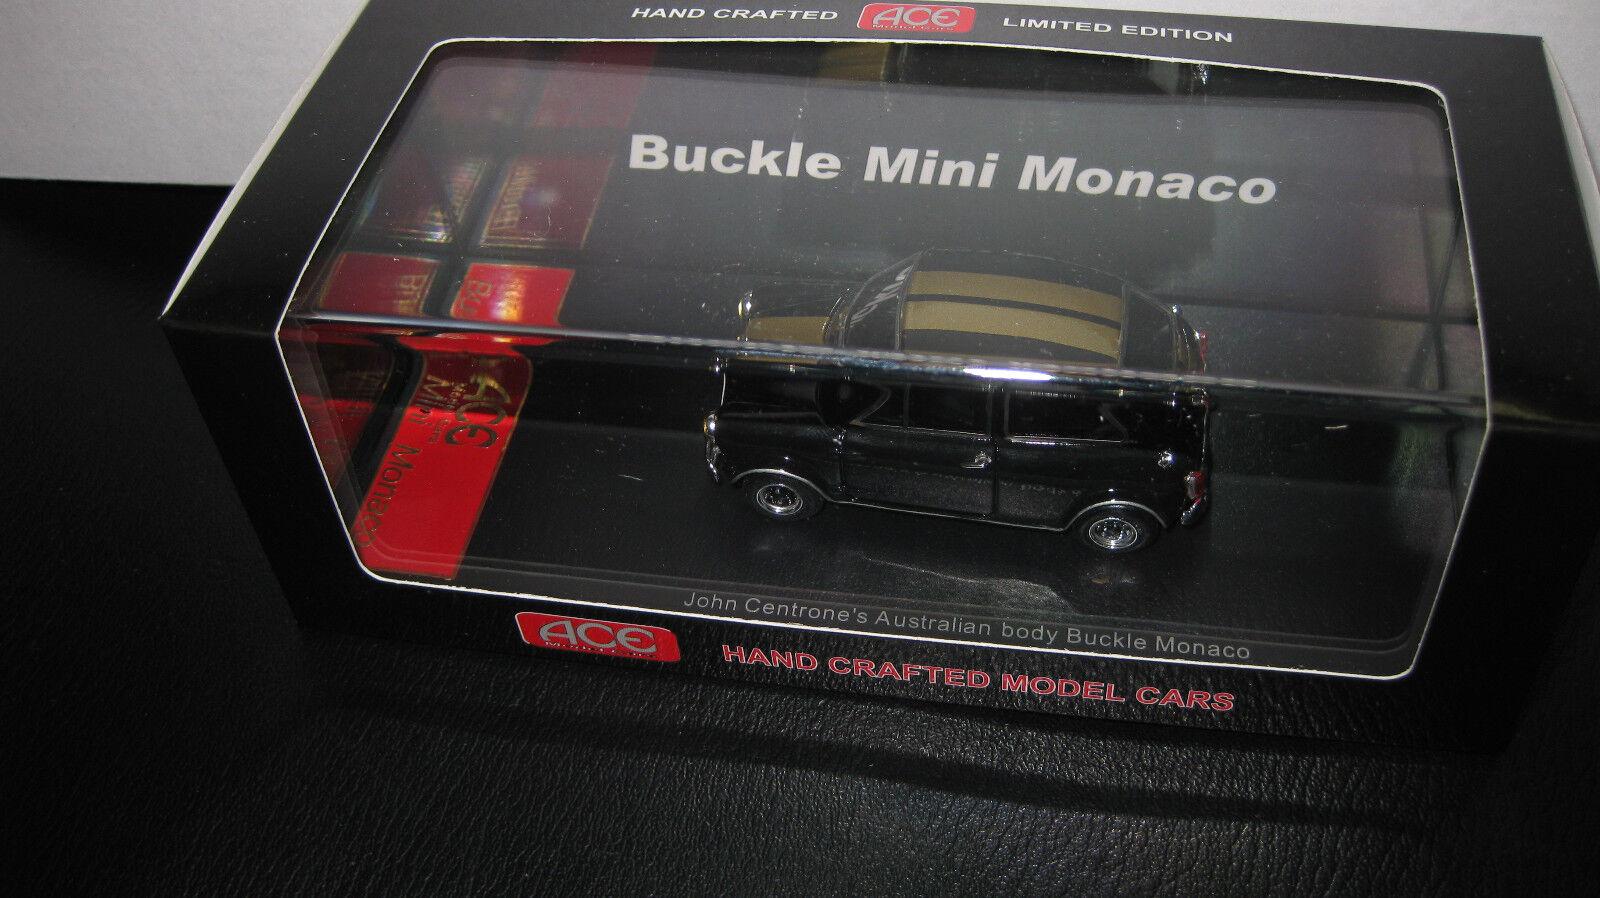 1 43 ACE MODEL CARS CARS CARS JOHN CENTRONE'S AUSTRALIAN BODY BUCKLE MINI MONACO negro 79e492